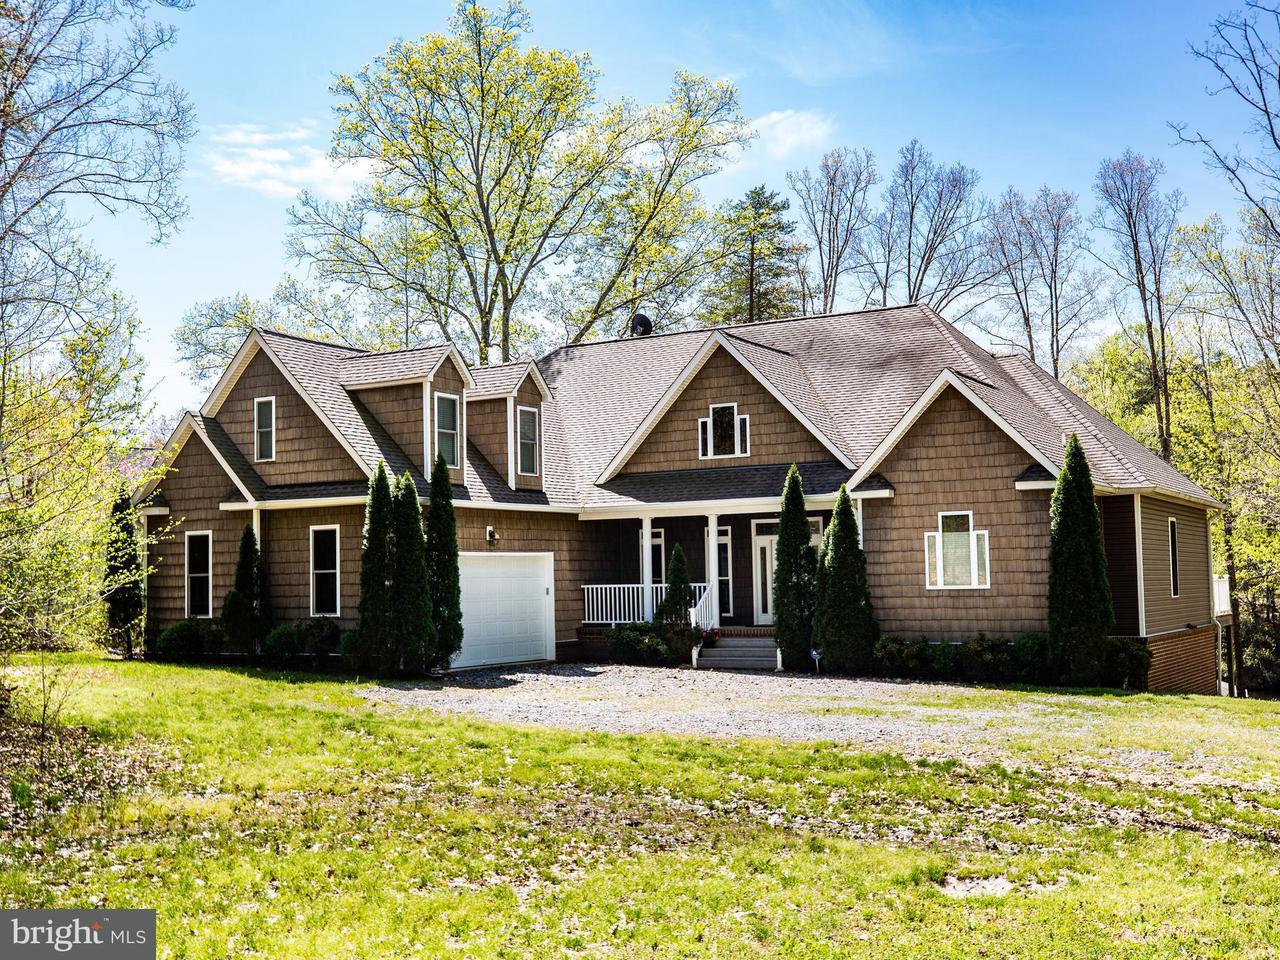 Single Family Home for Sale at 161 Rose Circle 161 Rose Circle Bumpass, Virginia 23024 United States